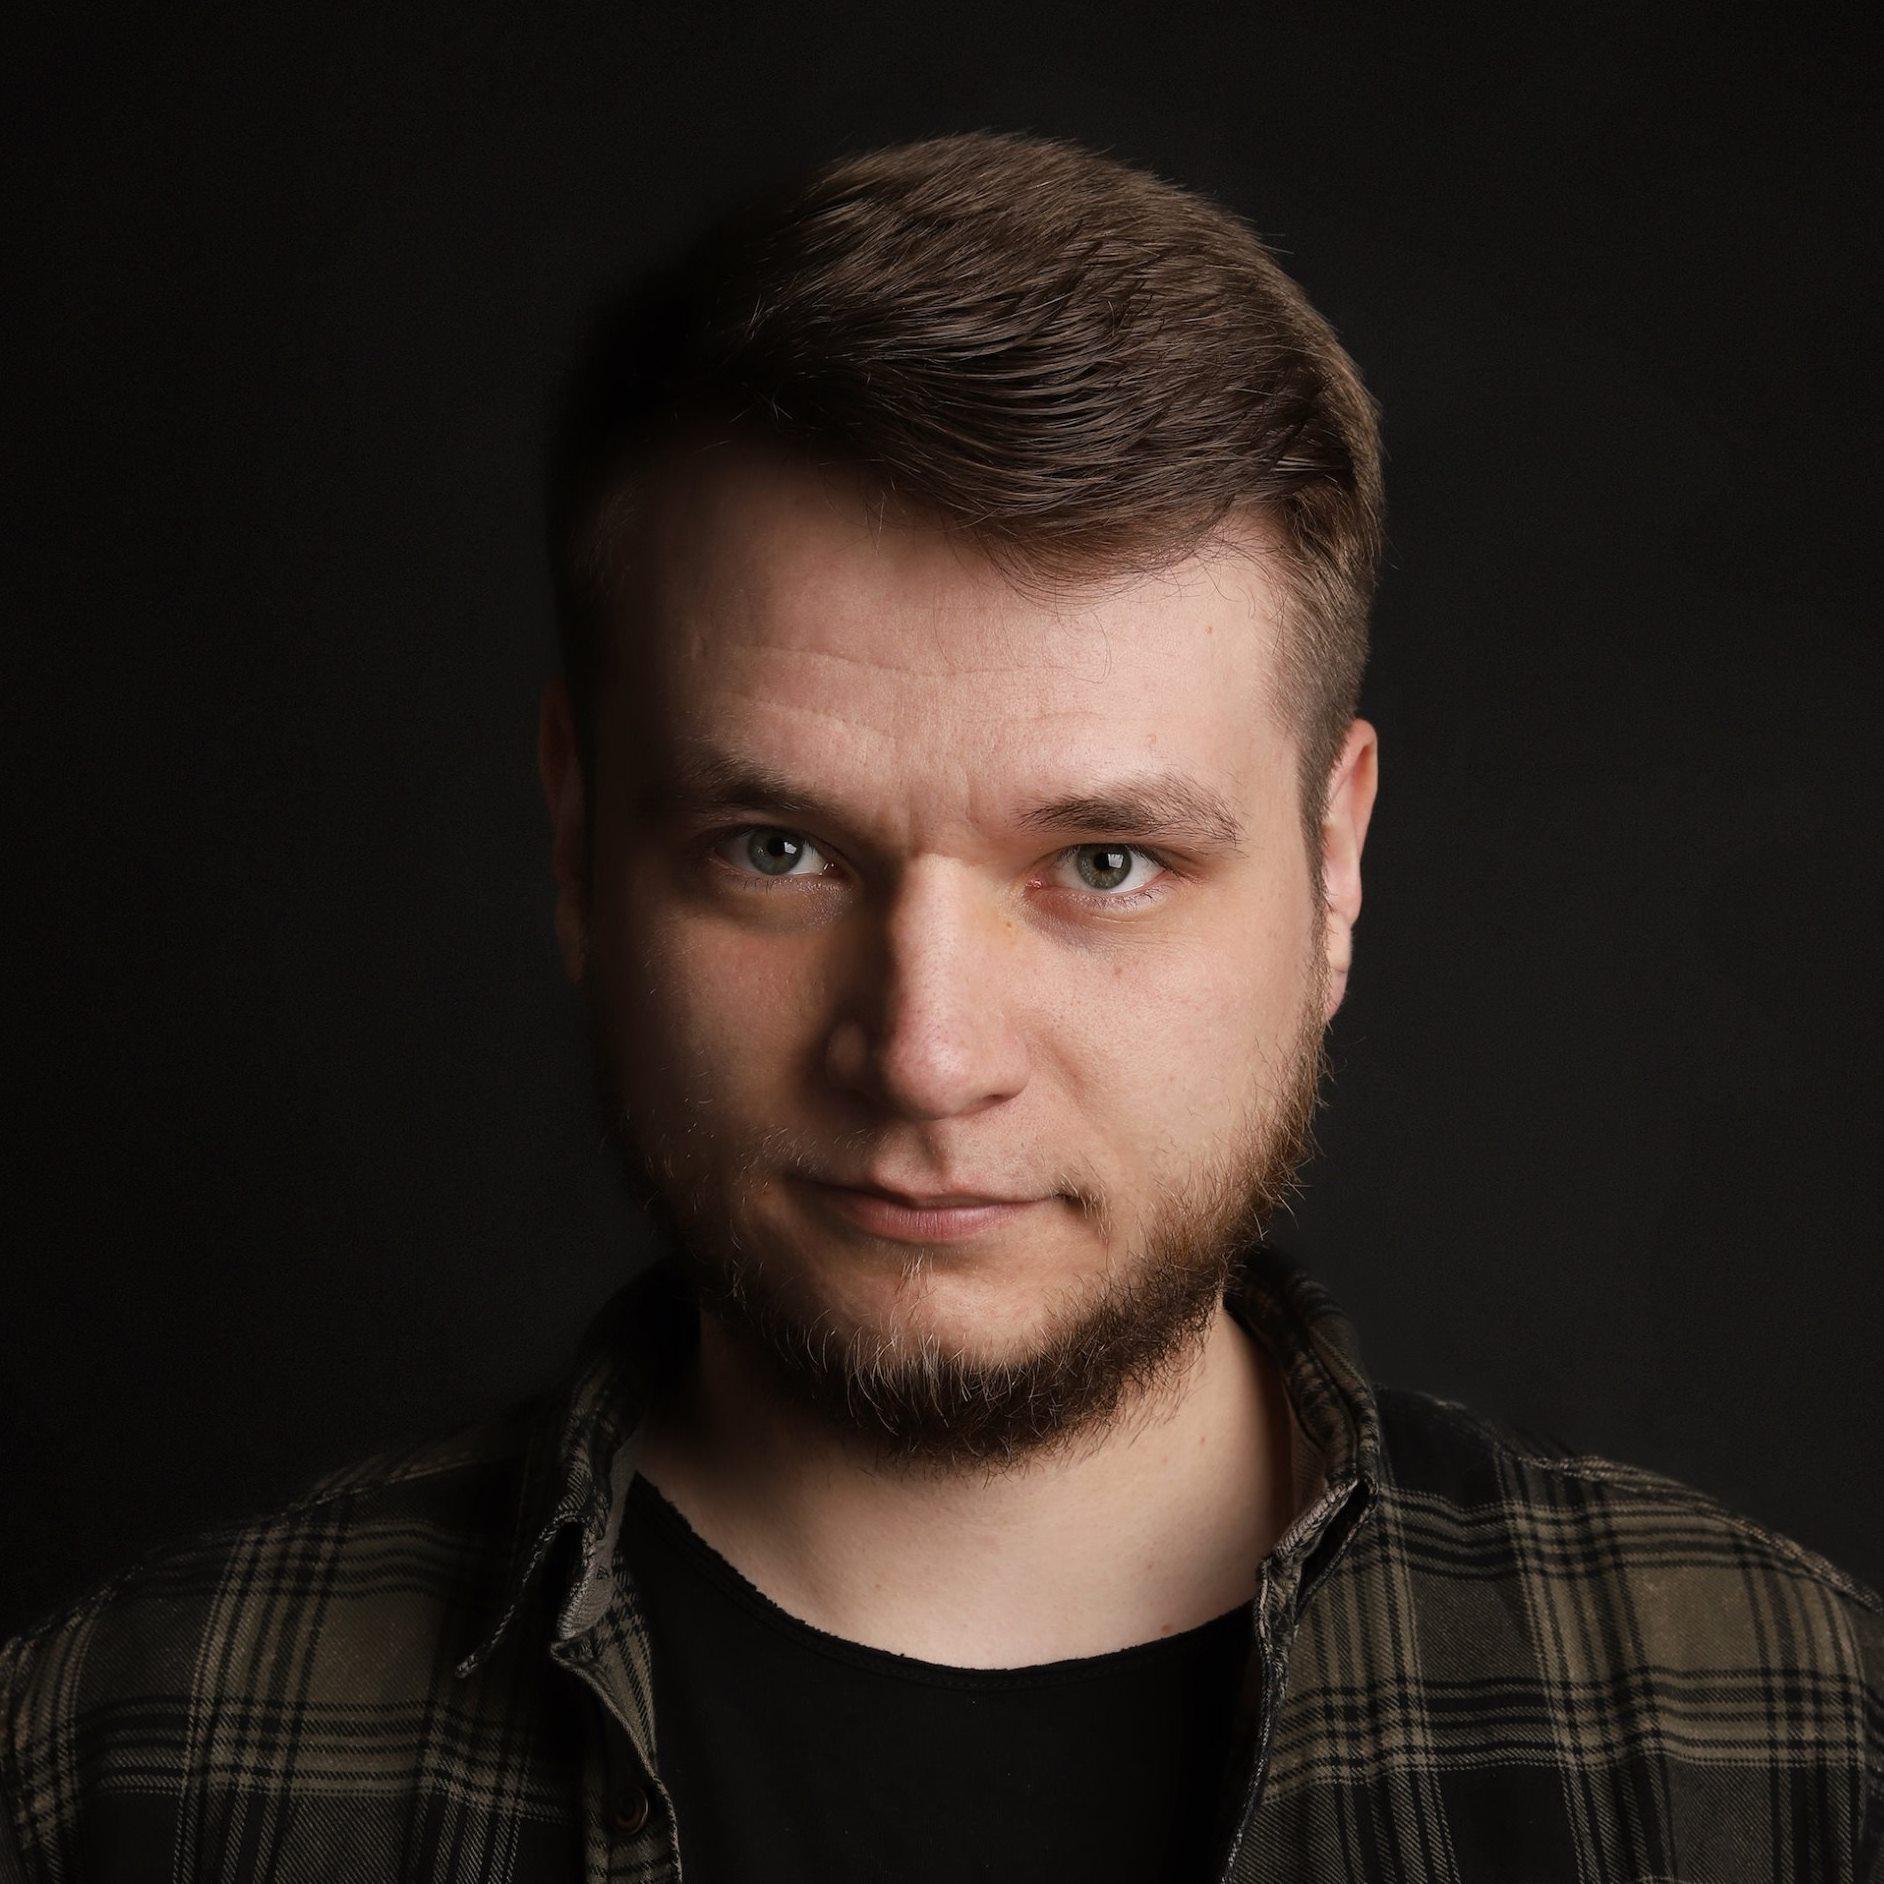 Avatar of Damian Dulisz